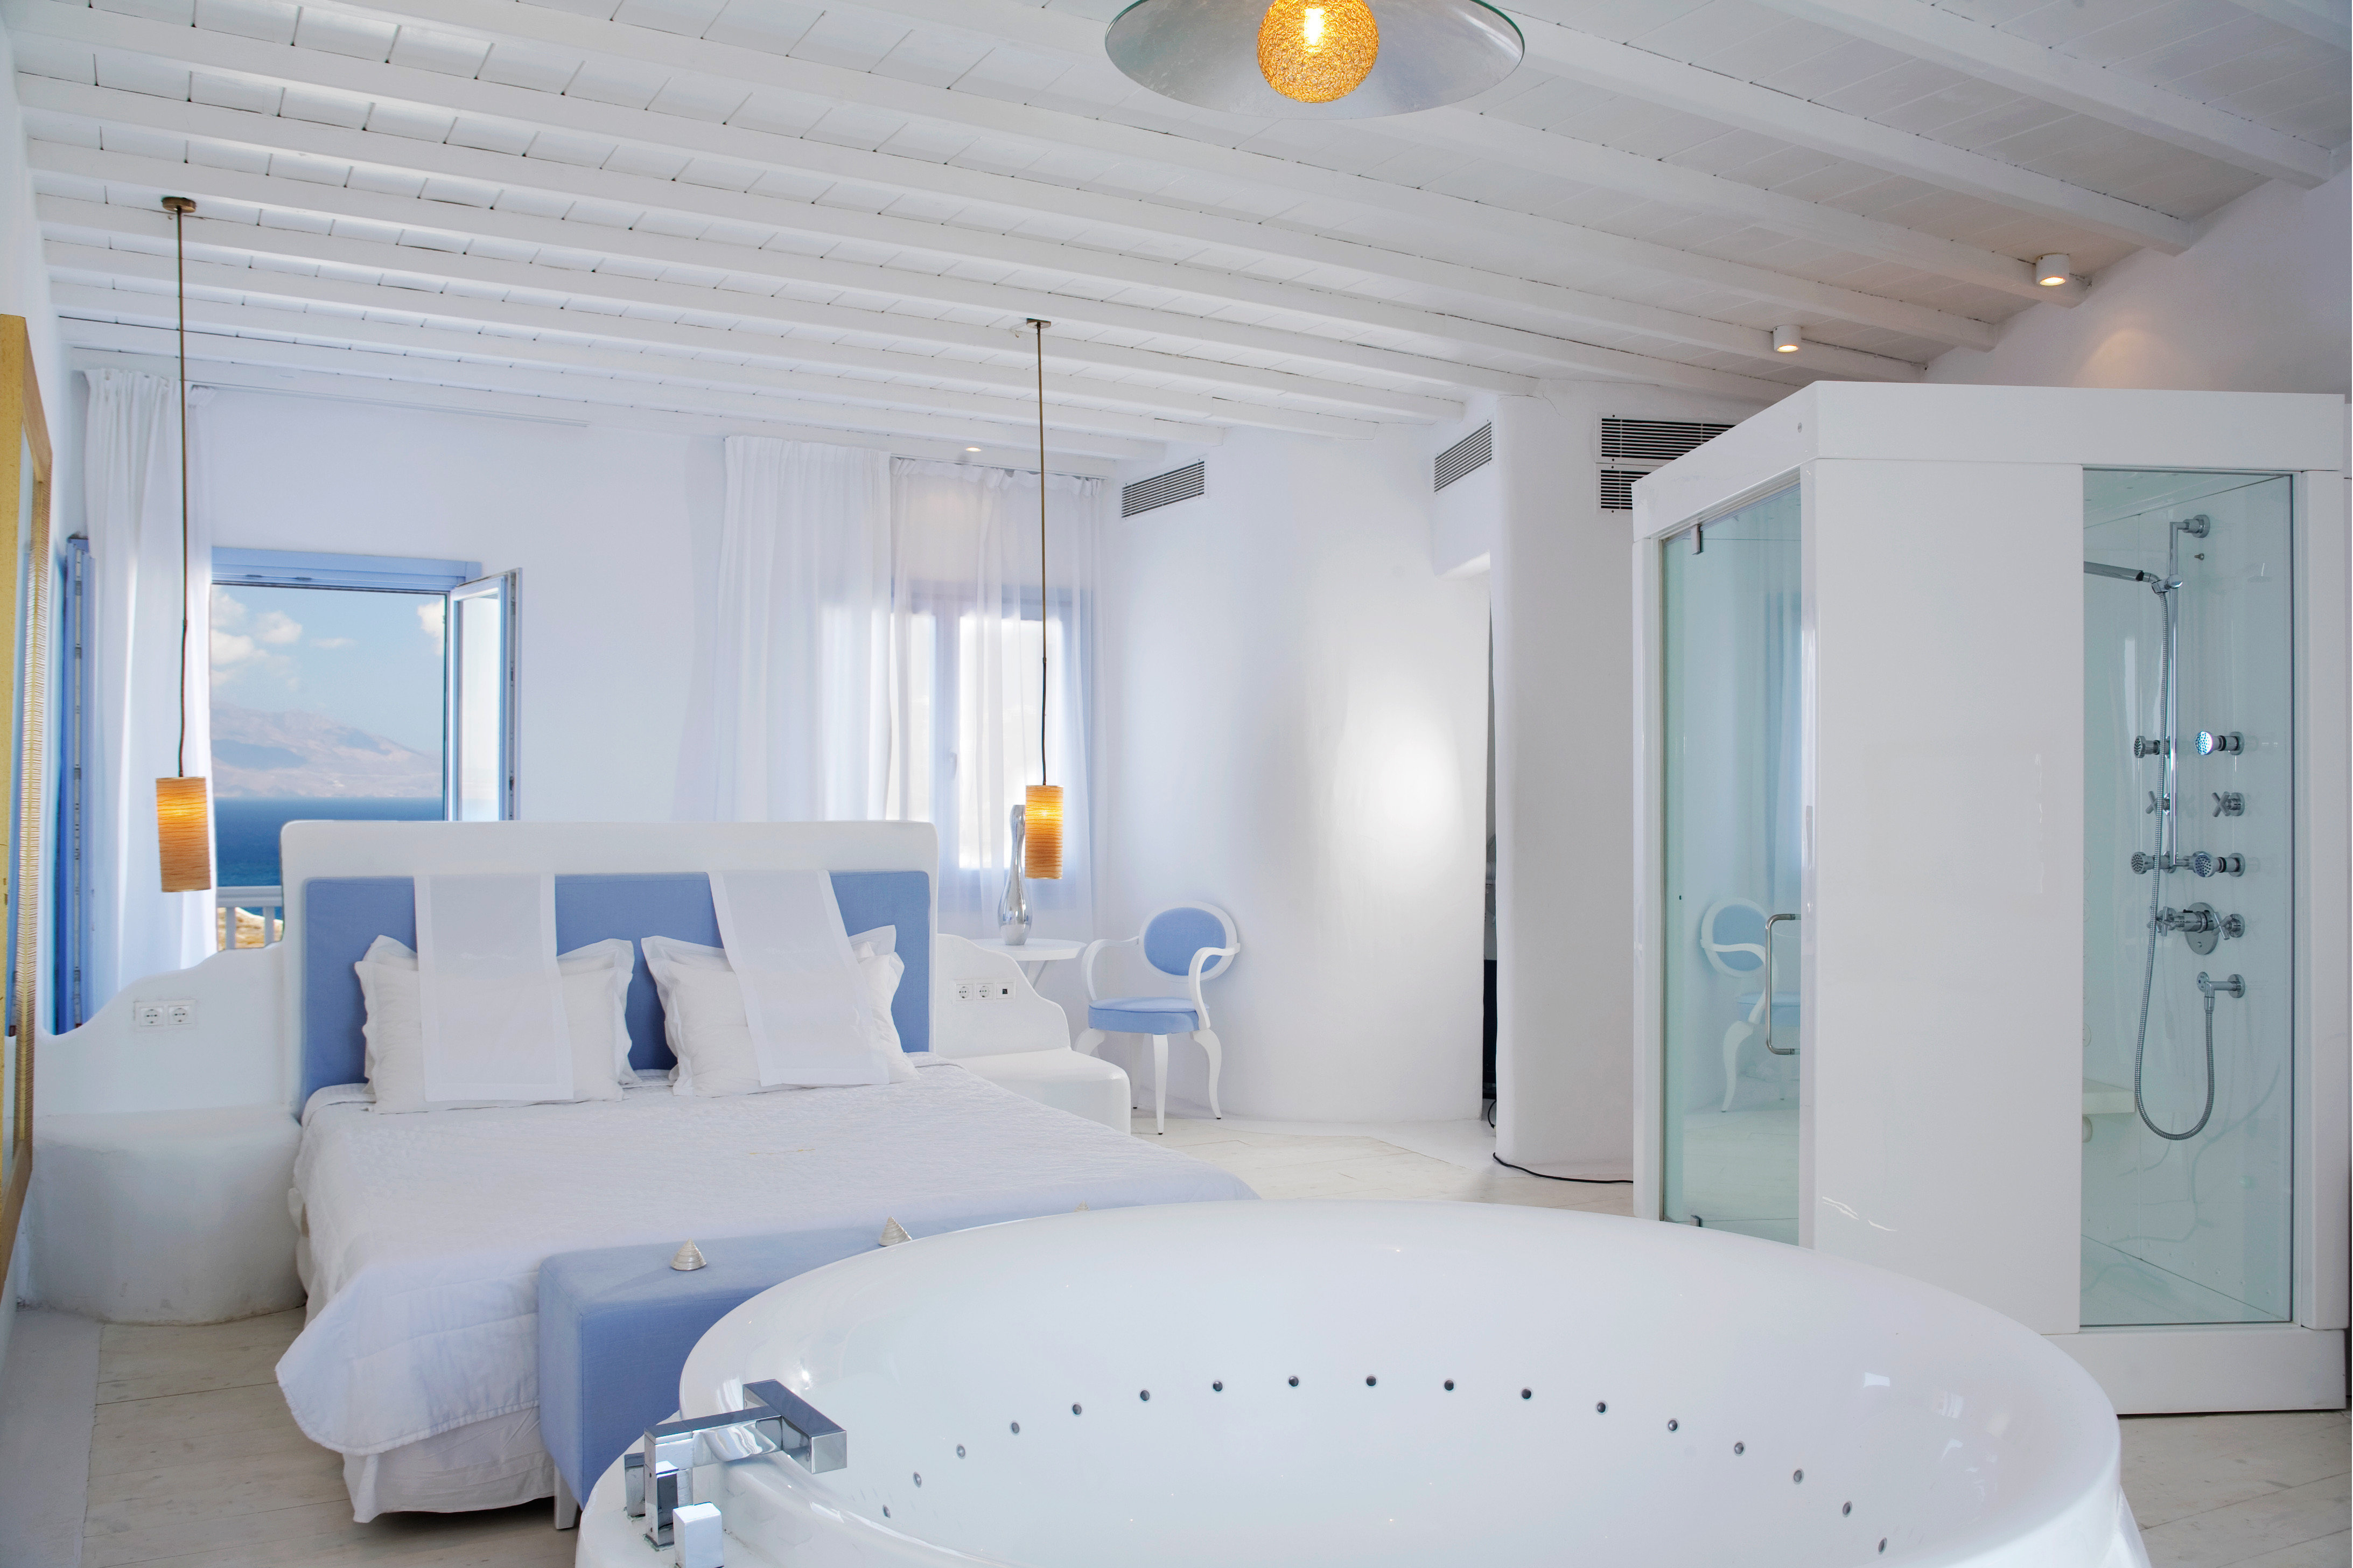 Bath Bedroom Boutique Hip Honeymoon Luxury Modern Romance Romantic Suite property swimming pool white sink bathtub